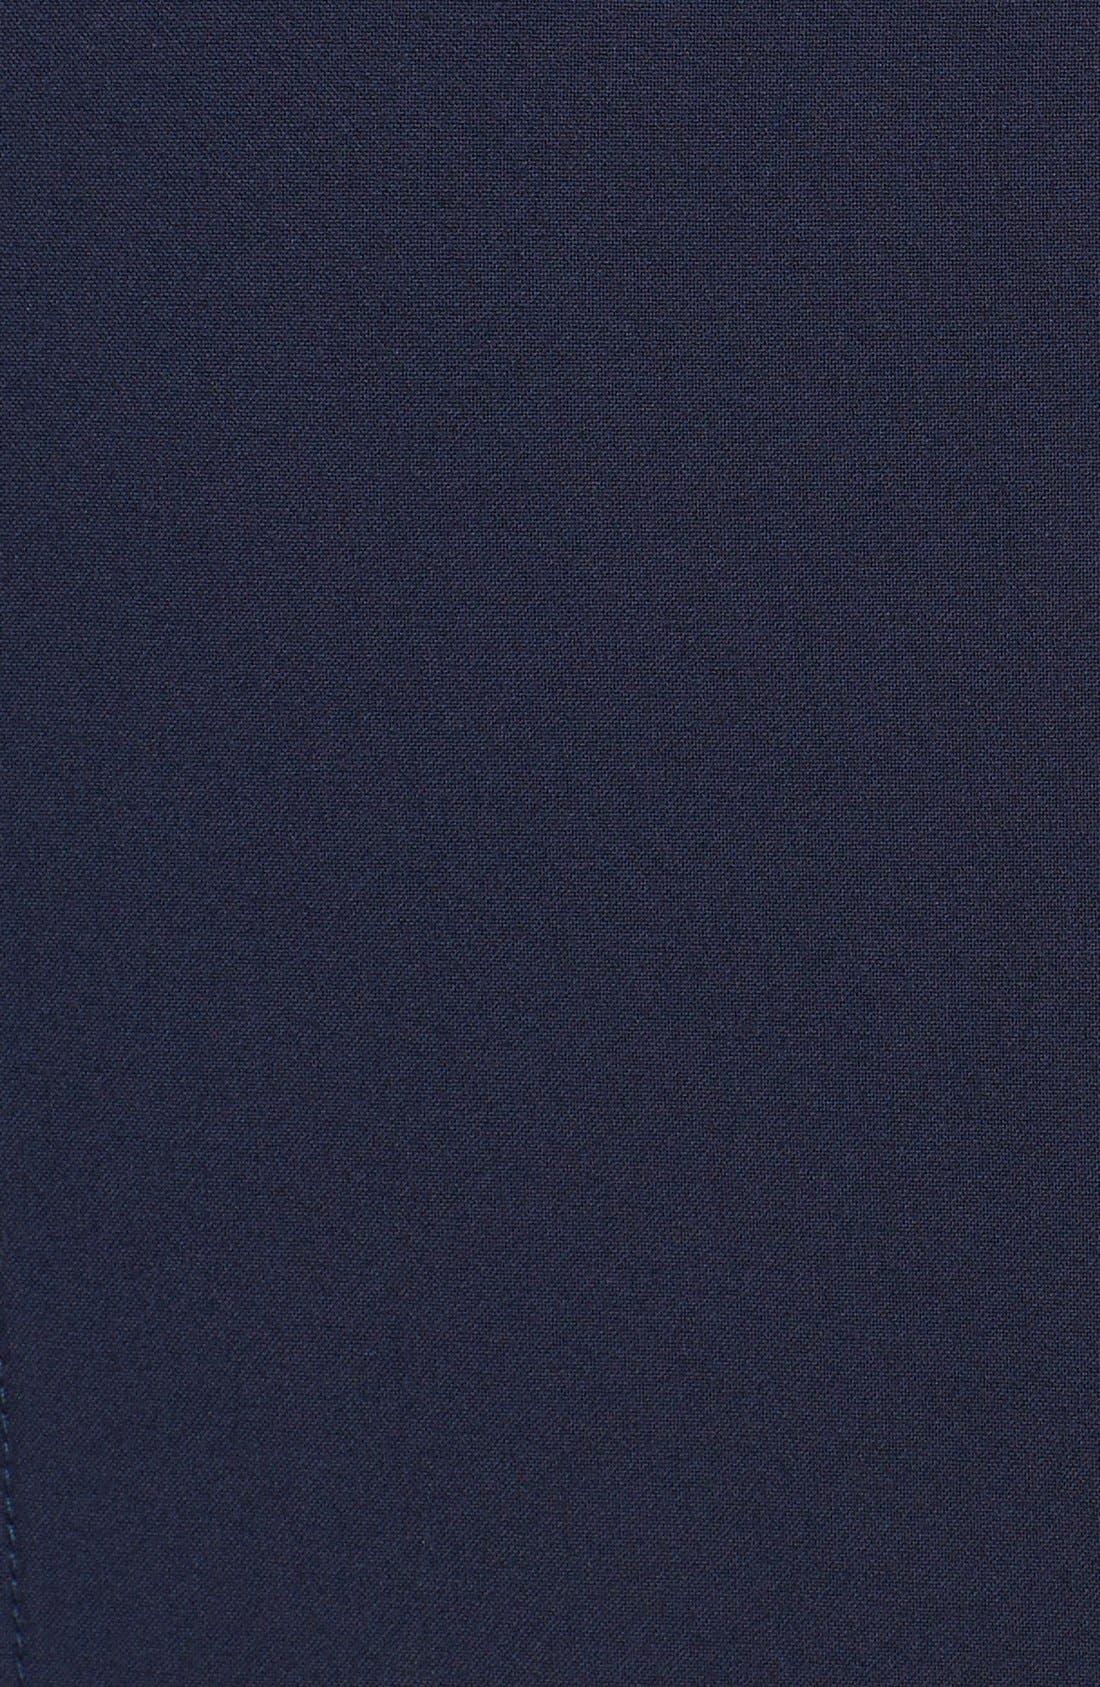 Sheath Dress,                             Alternate thumbnail 21, color,